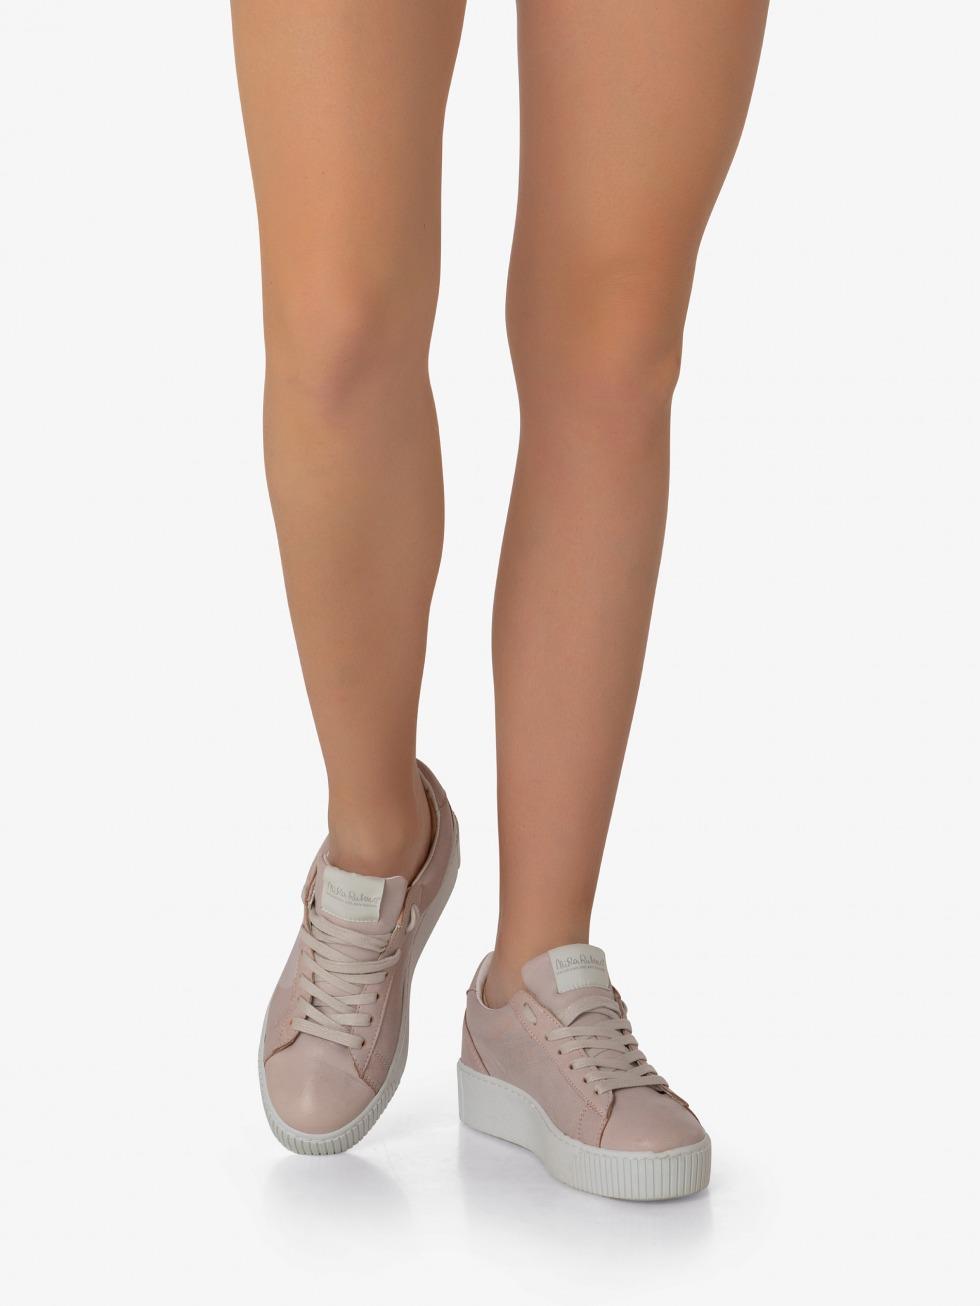 Cosmopolitan Sneakers - Taffy Heart